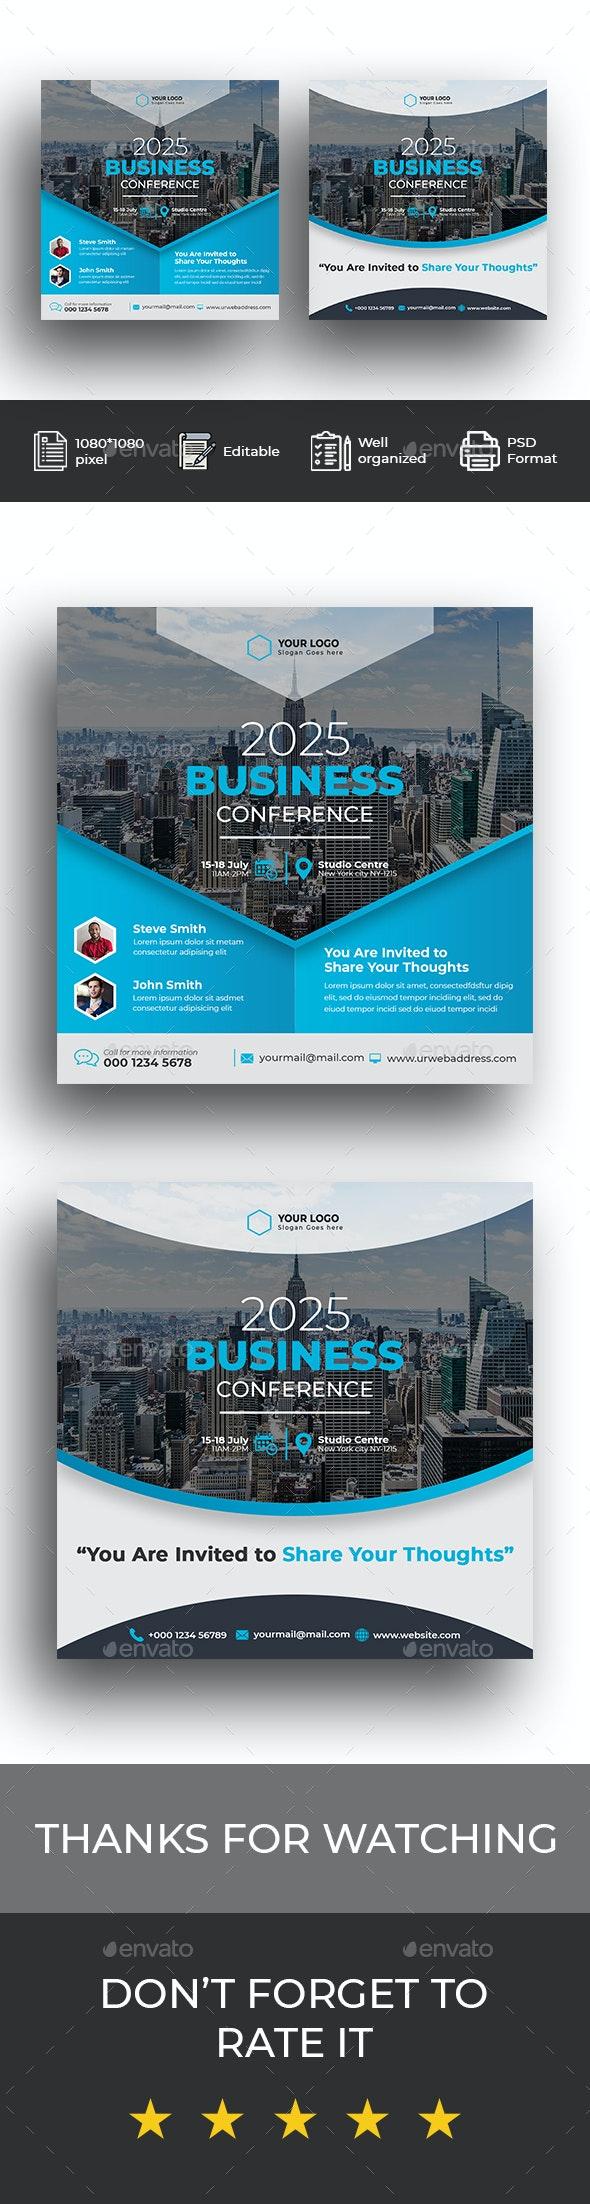 Business Conference Social Media Post - Social Media Web Elements